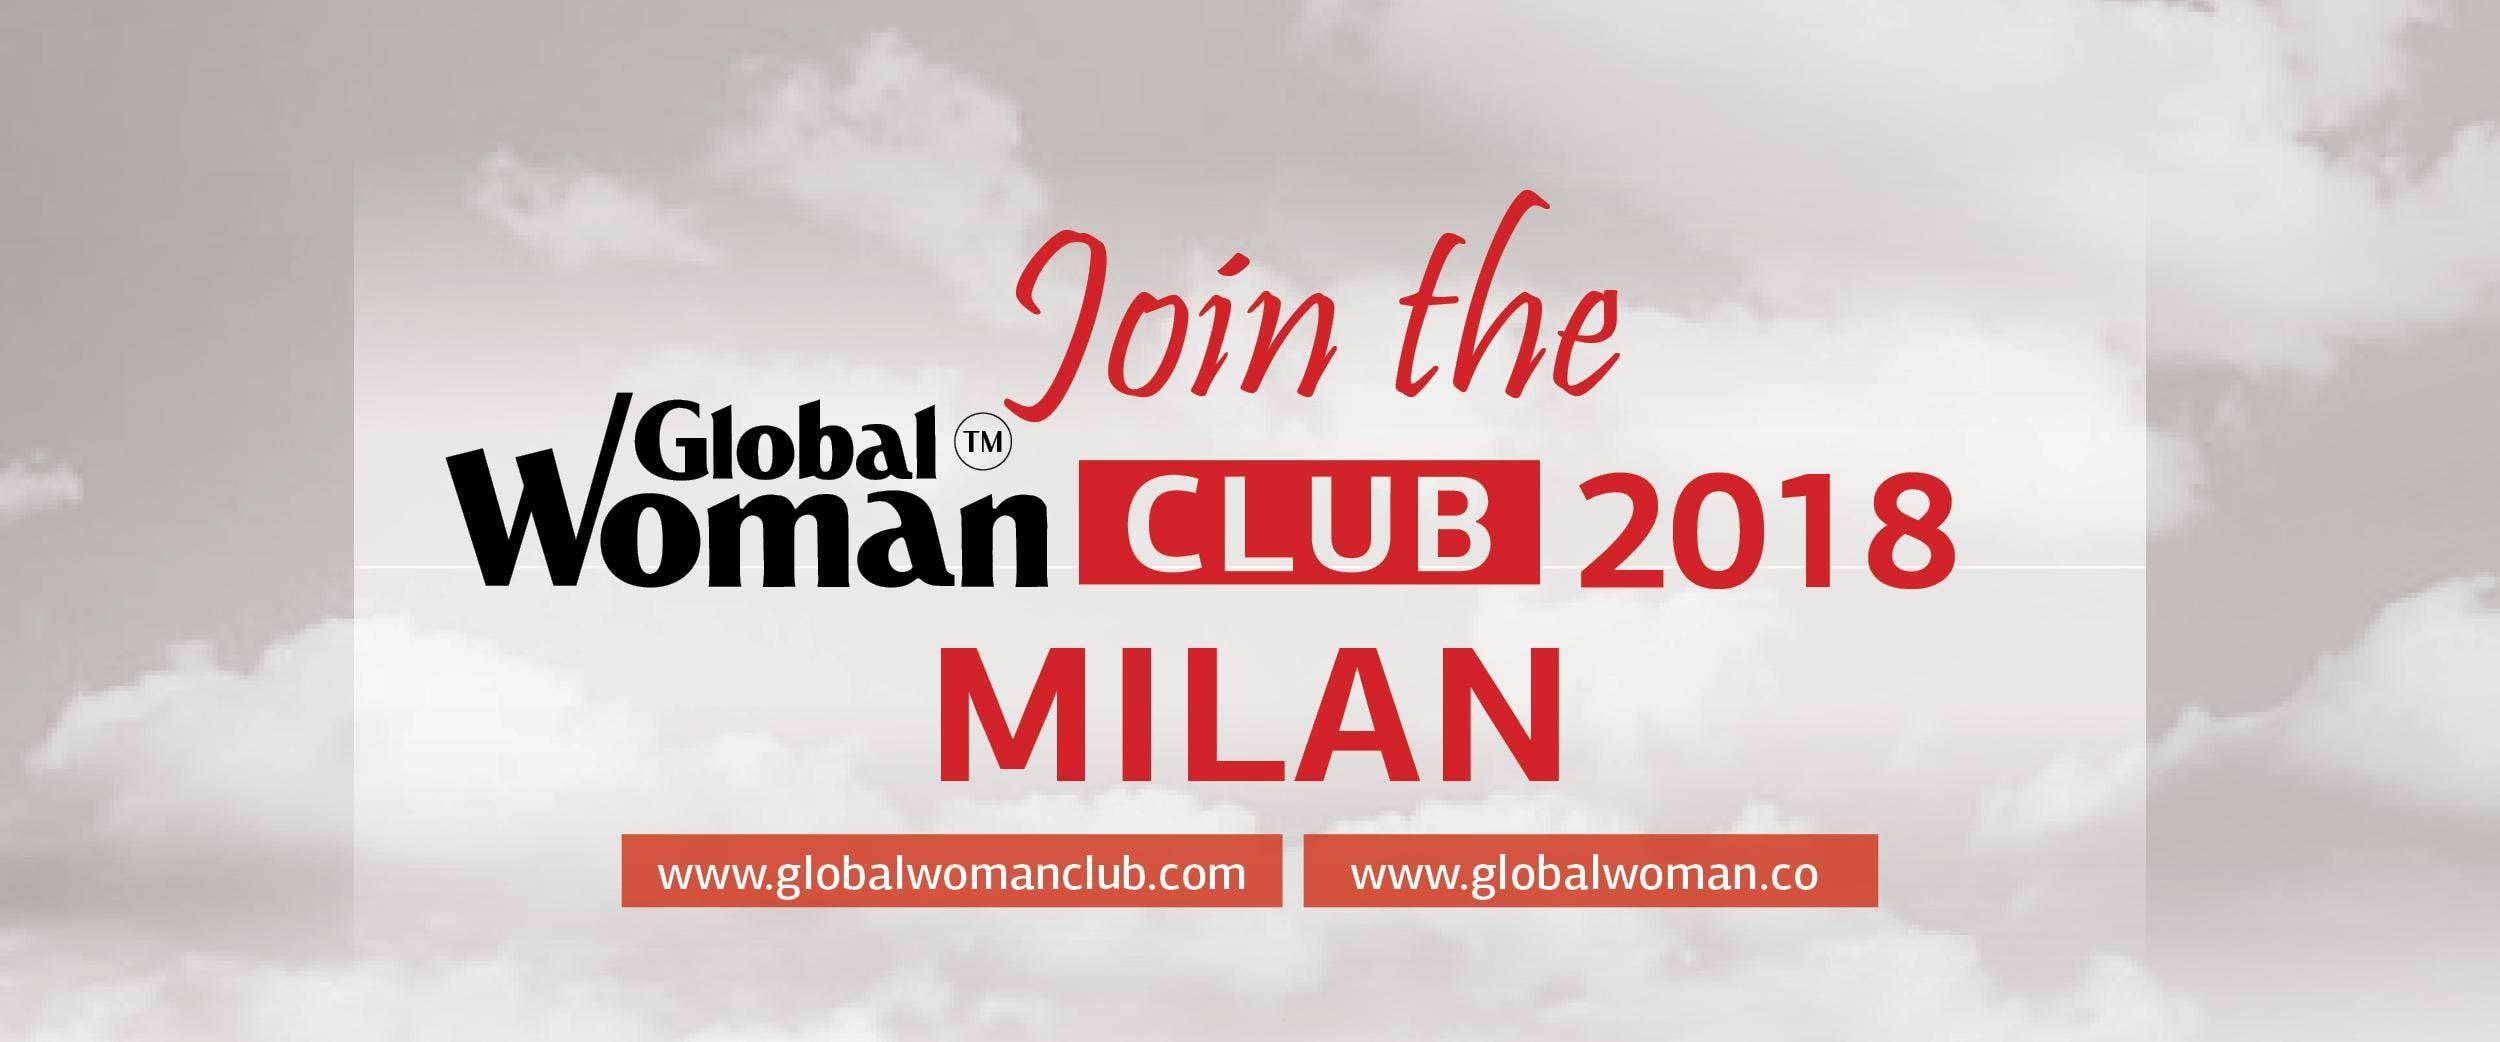 GLOBAL WOMAN CLUB MILAN - BUSINESS BREAKFAST